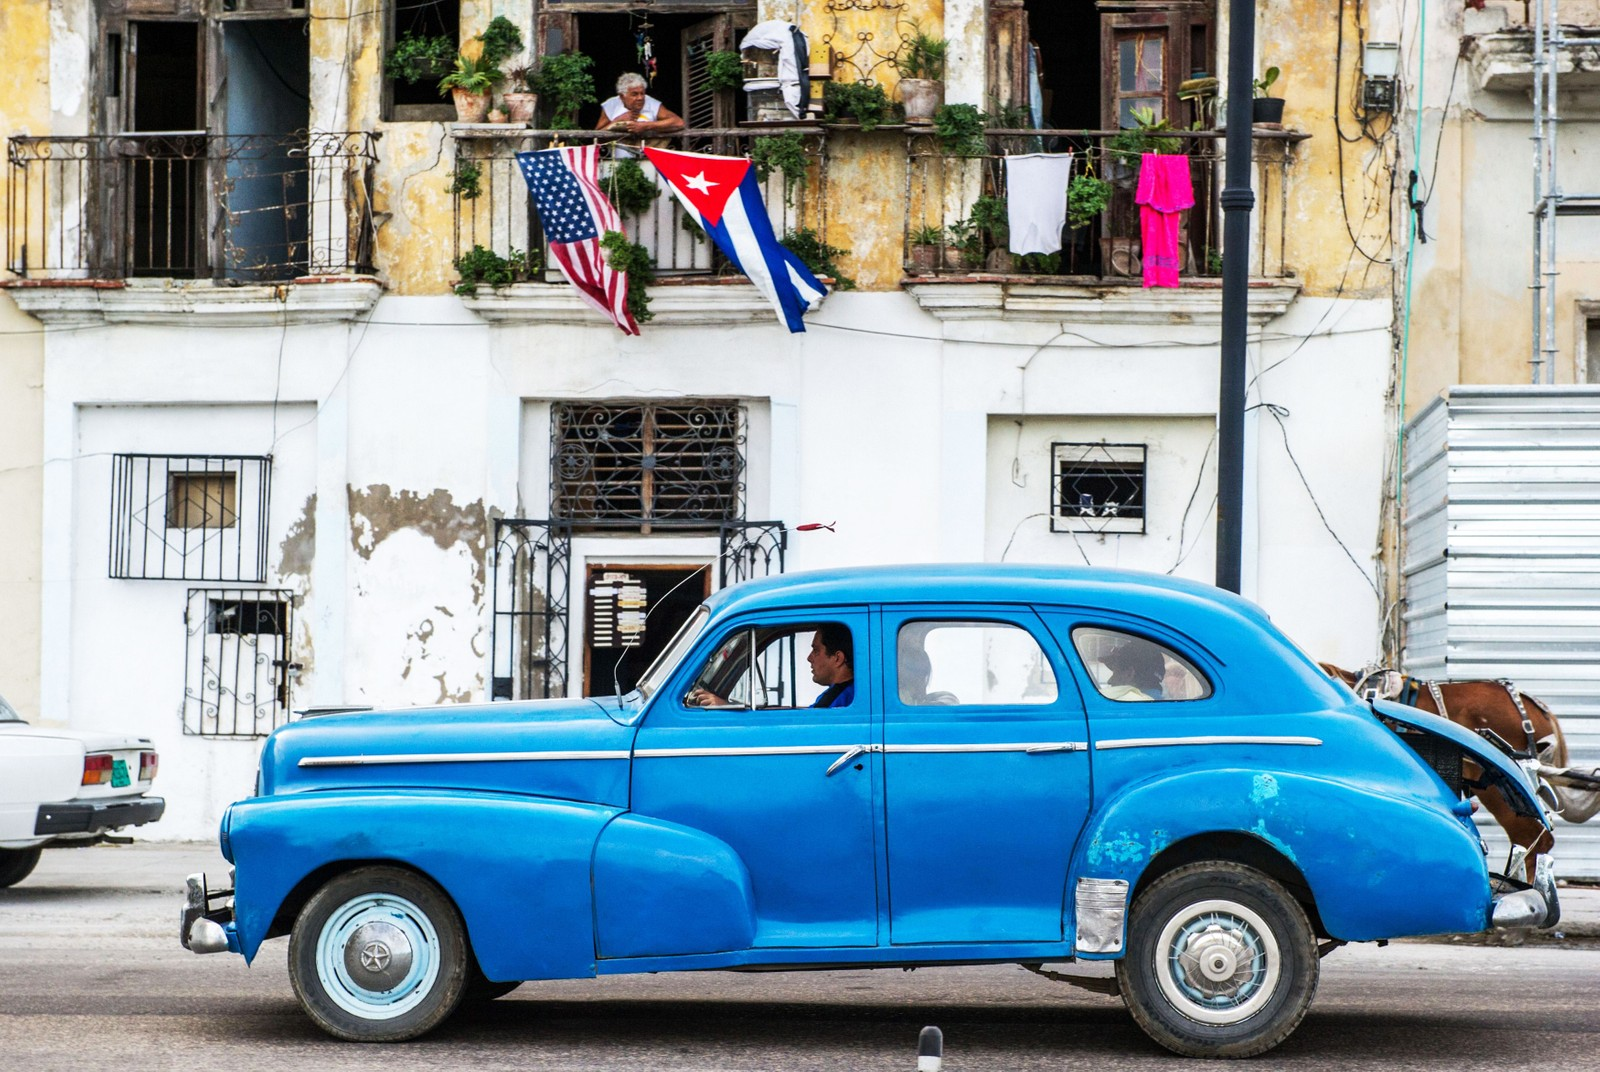 Amerikansk 50-tallsbil i Havannas gater 19. desember i år.